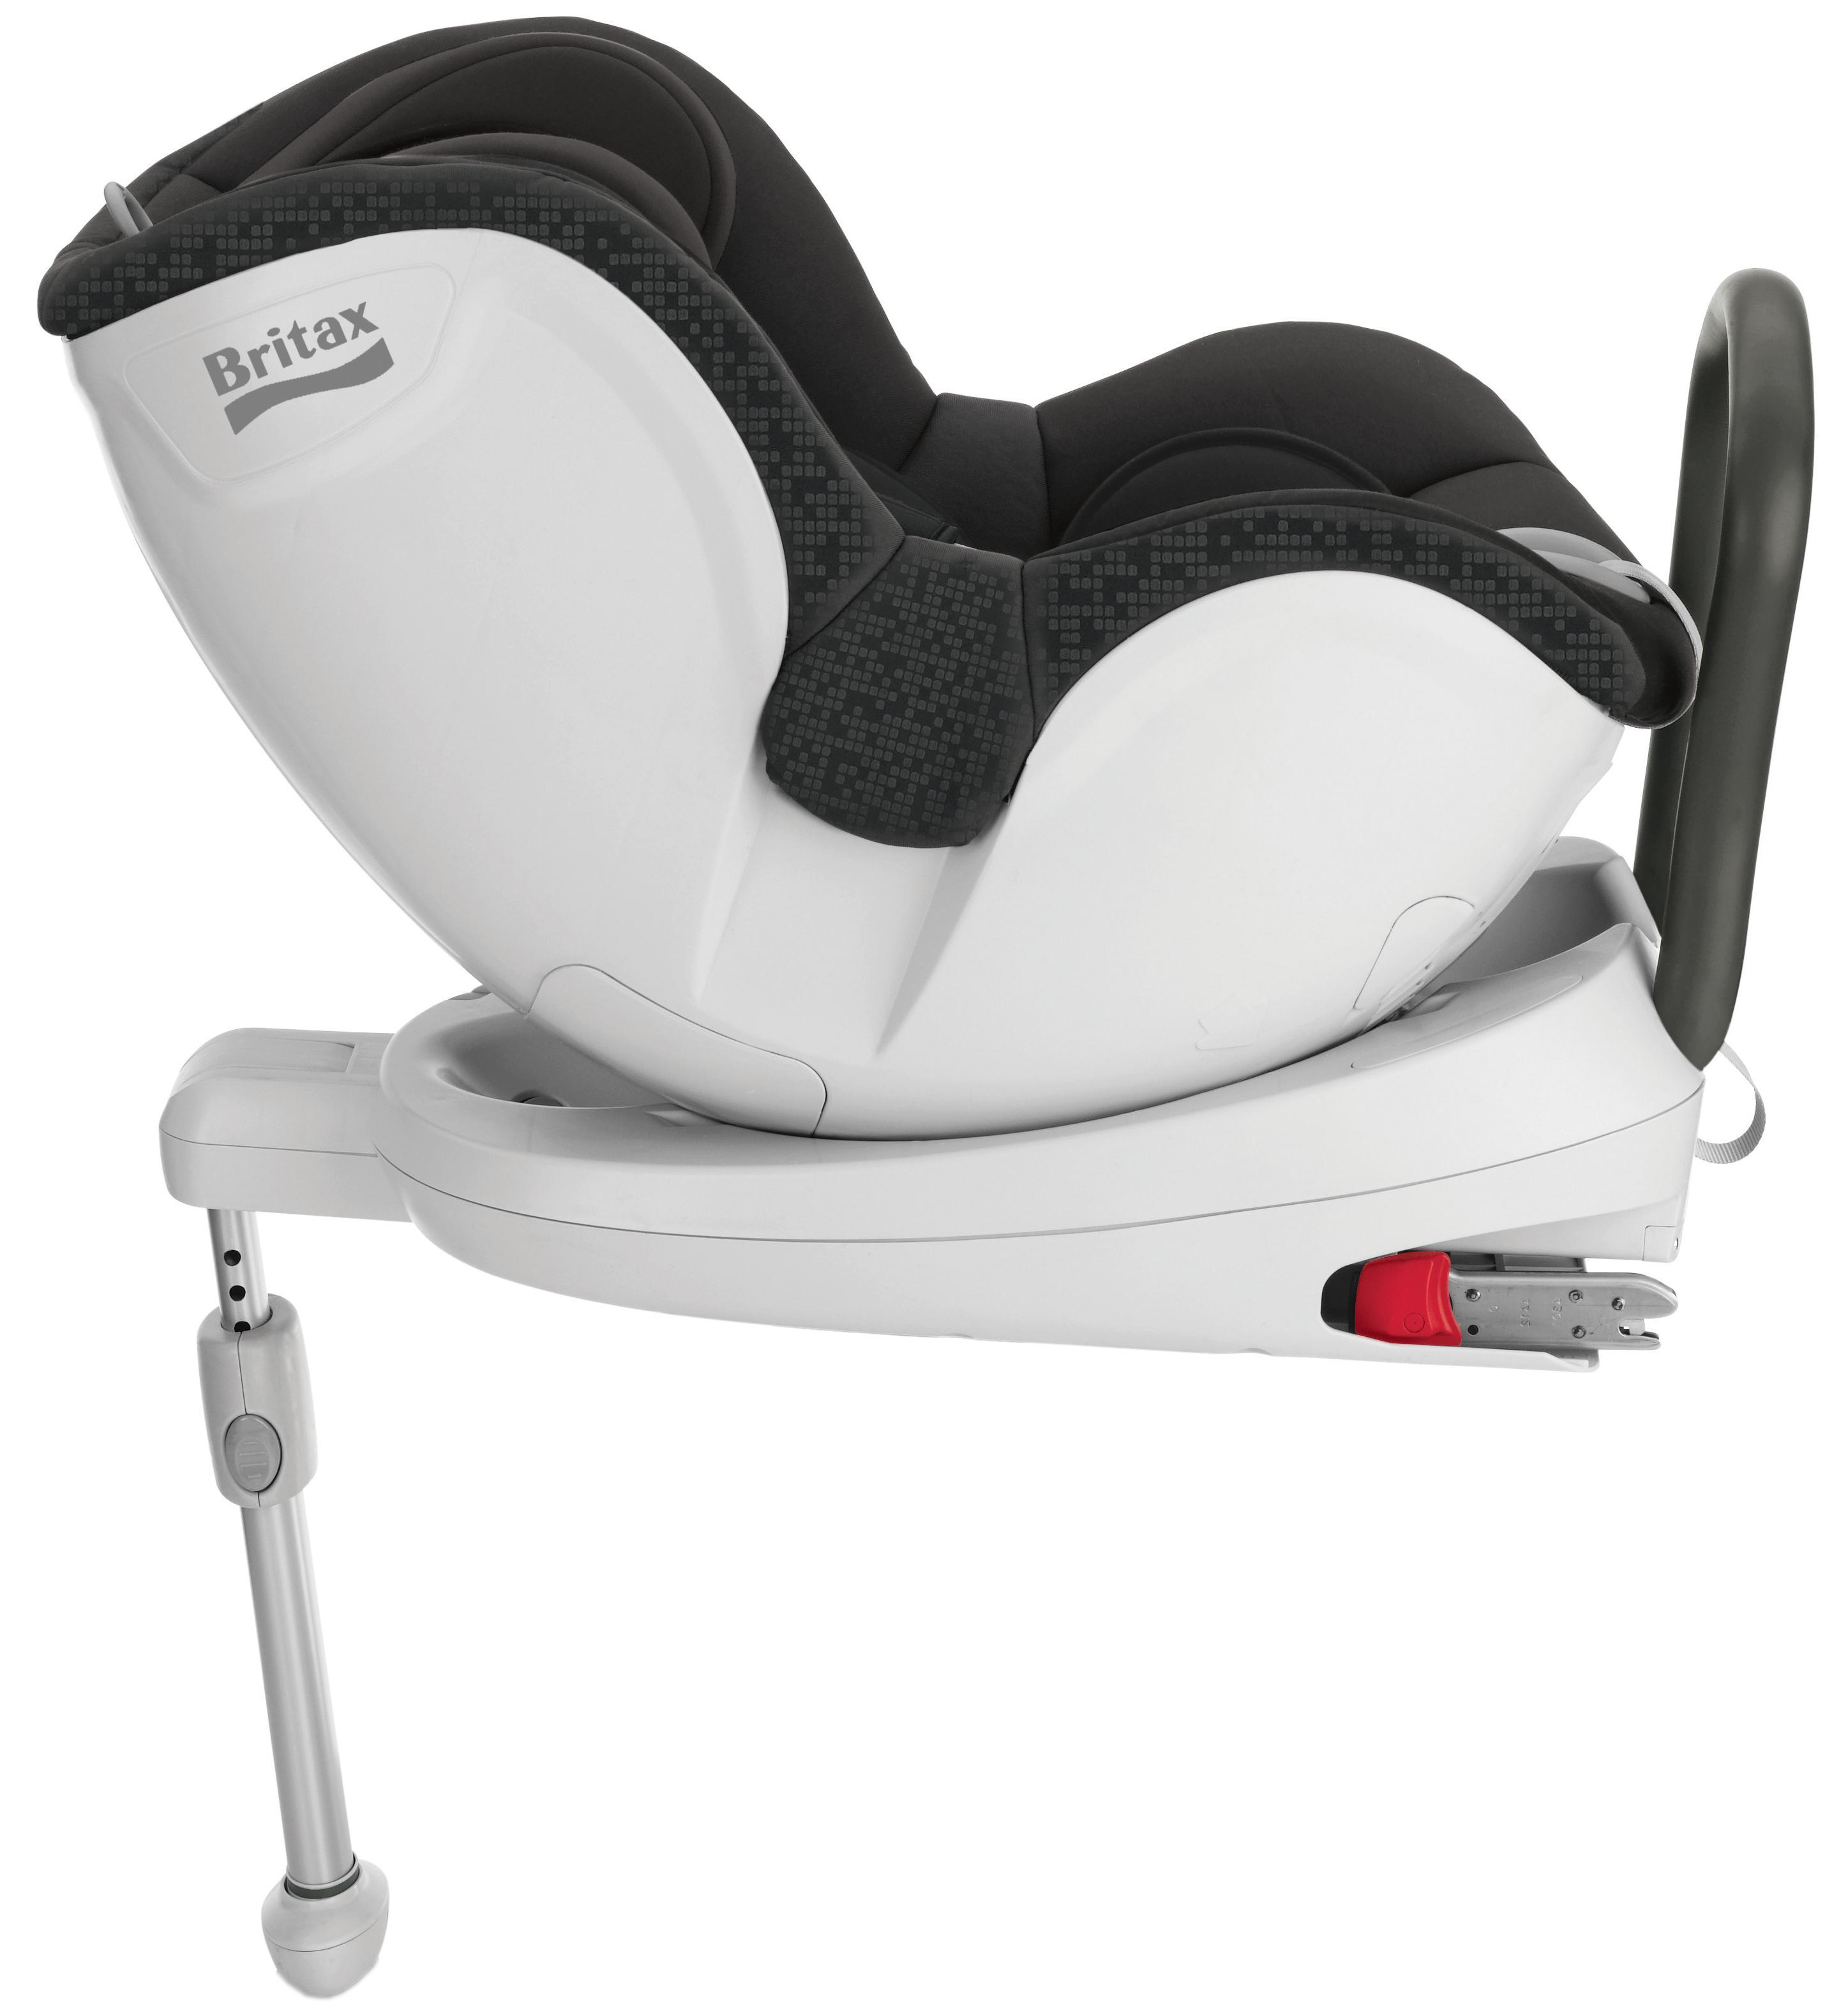 britax dualfix black thunder children kids car seat group 0 1 0 18kg 0 4yrs. Black Bedroom Furniture Sets. Home Design Ideas